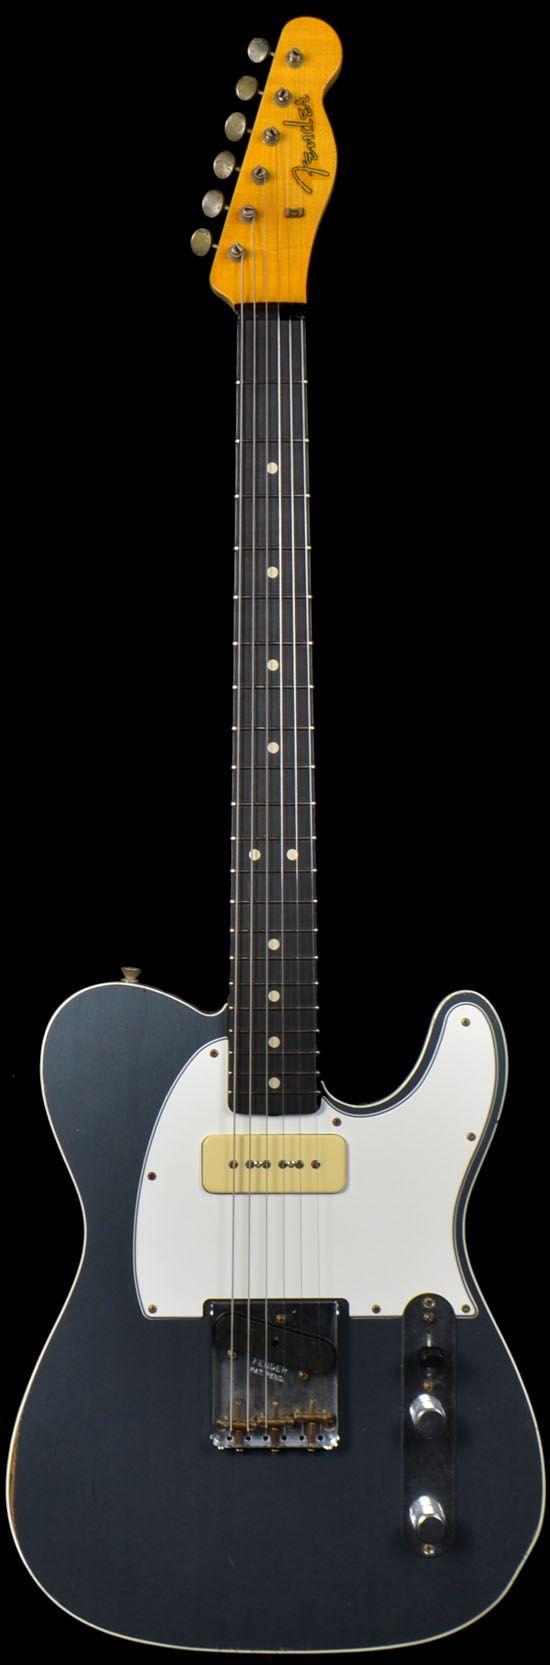 Fender 2 Tone Telecaster w P90 Charcoal Frost Metallic Black Back